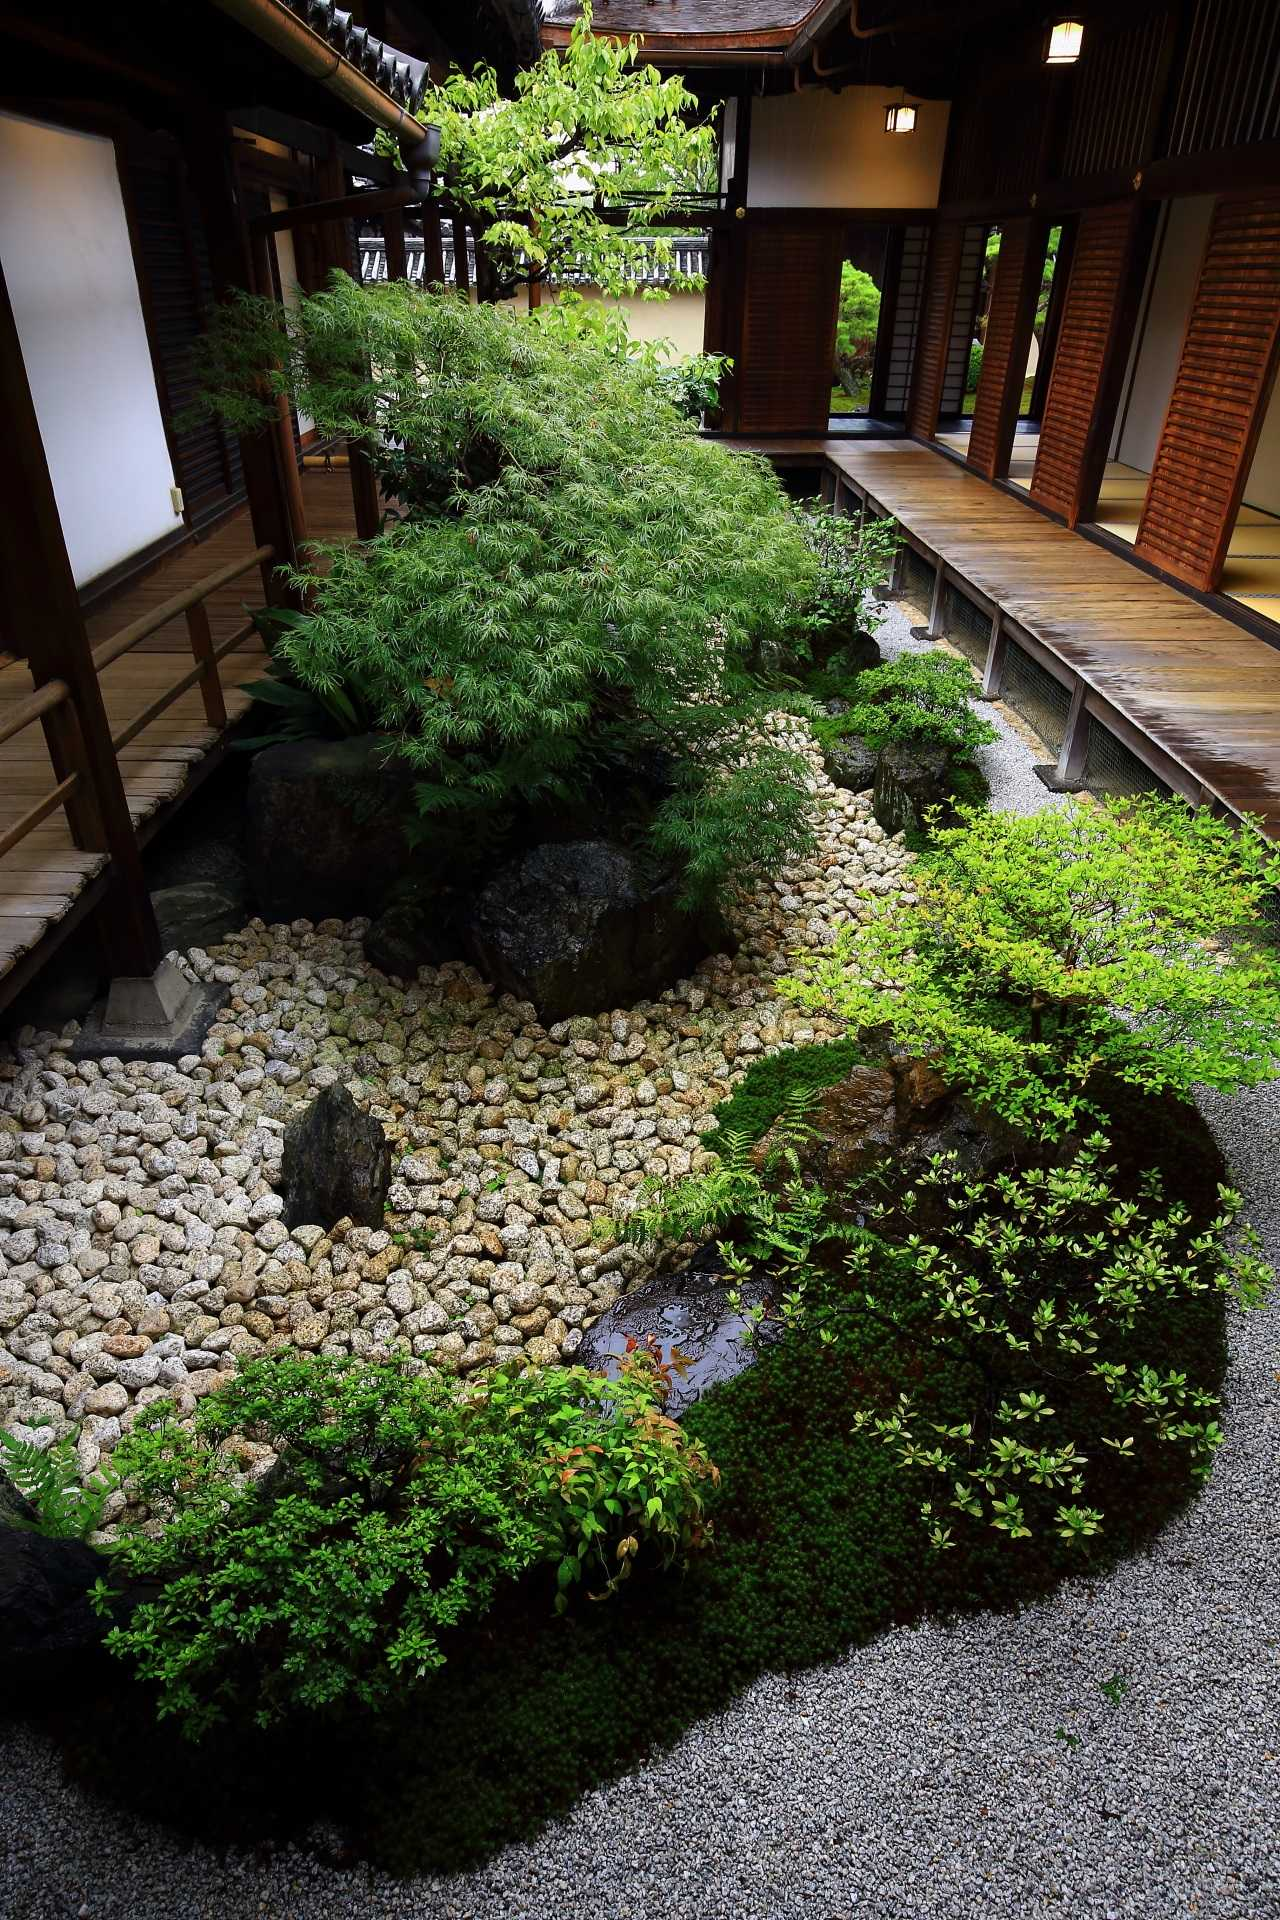 35 Fascinating Japanese Garden Design Ideas Page 23 Of 35 Gardenholic